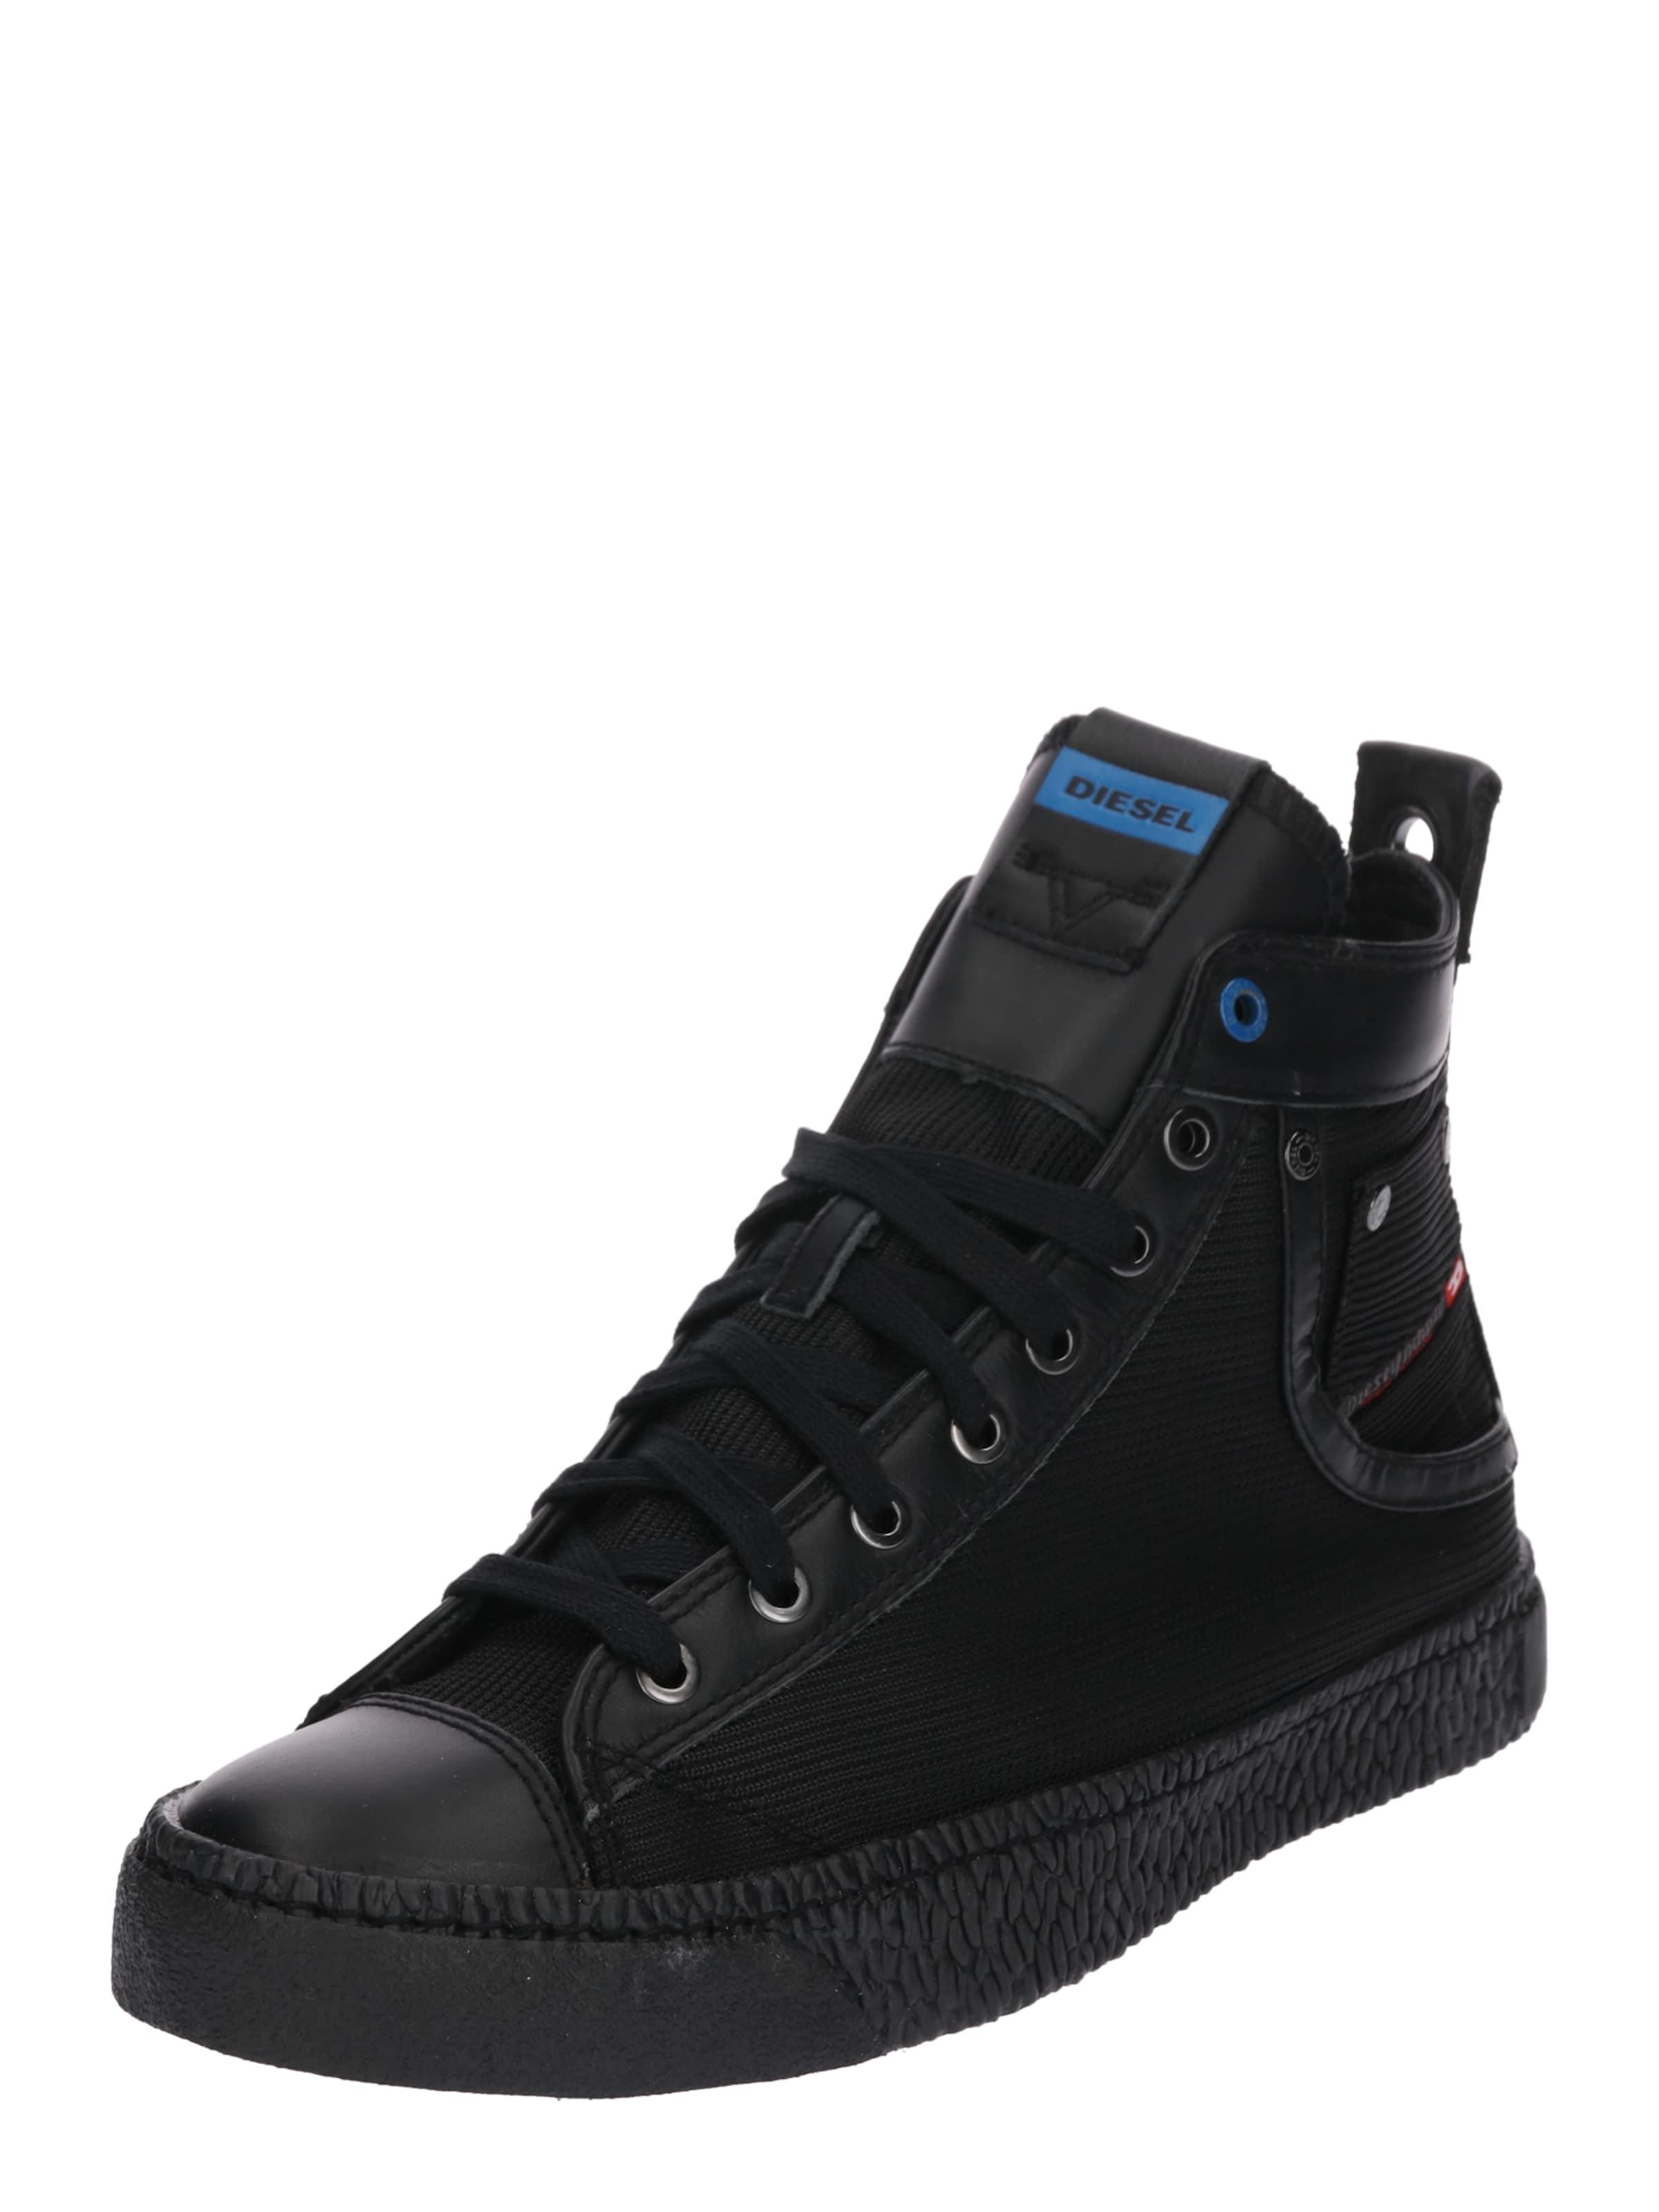 DIESEL Sneaker EXPOSURE I Verschleißfeste billige Schuhe